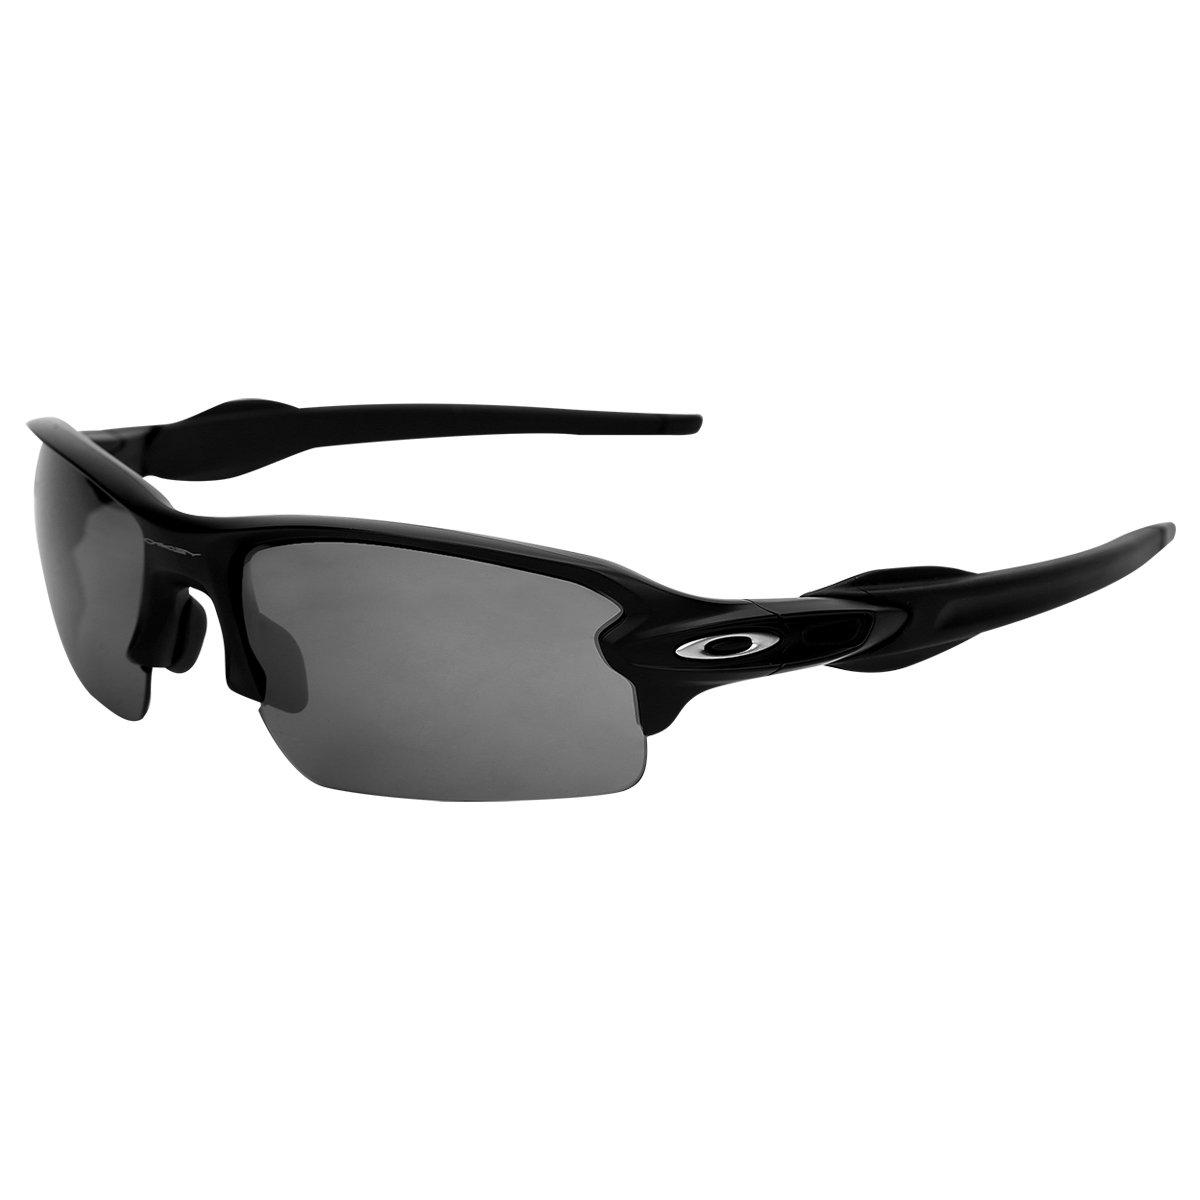 faffa2be2e6cd Óculos Oakley Flak 2.0 - Compre Agora